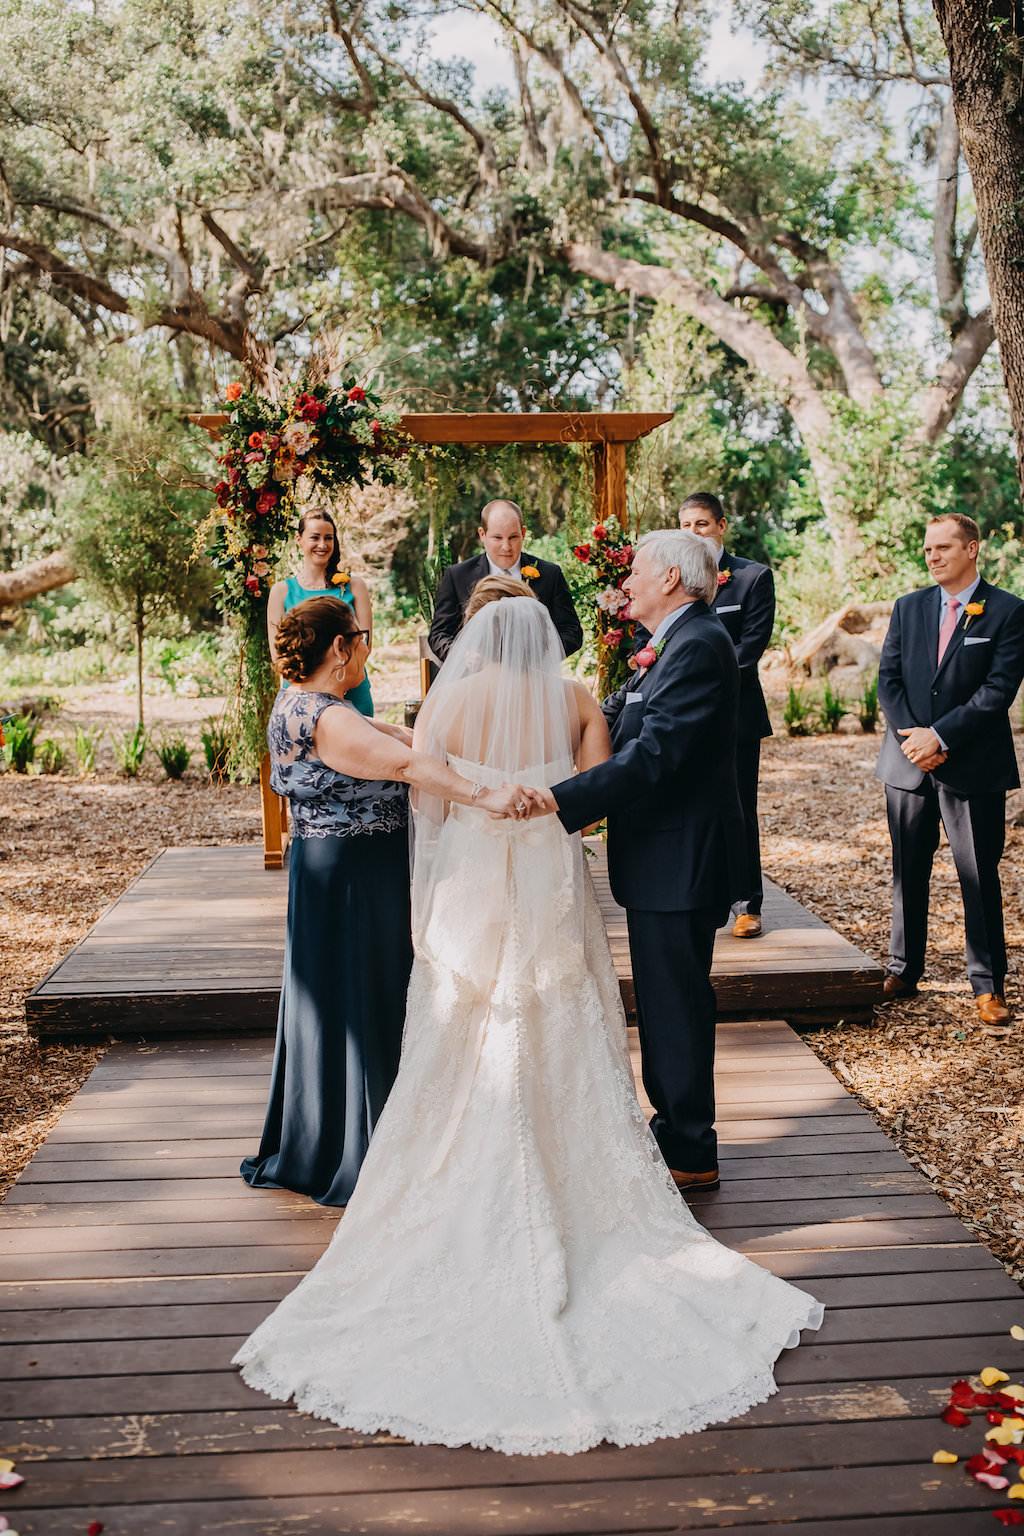 Outdoor Tropical Wedding Ceremony Portrait | Tampa Bay ...